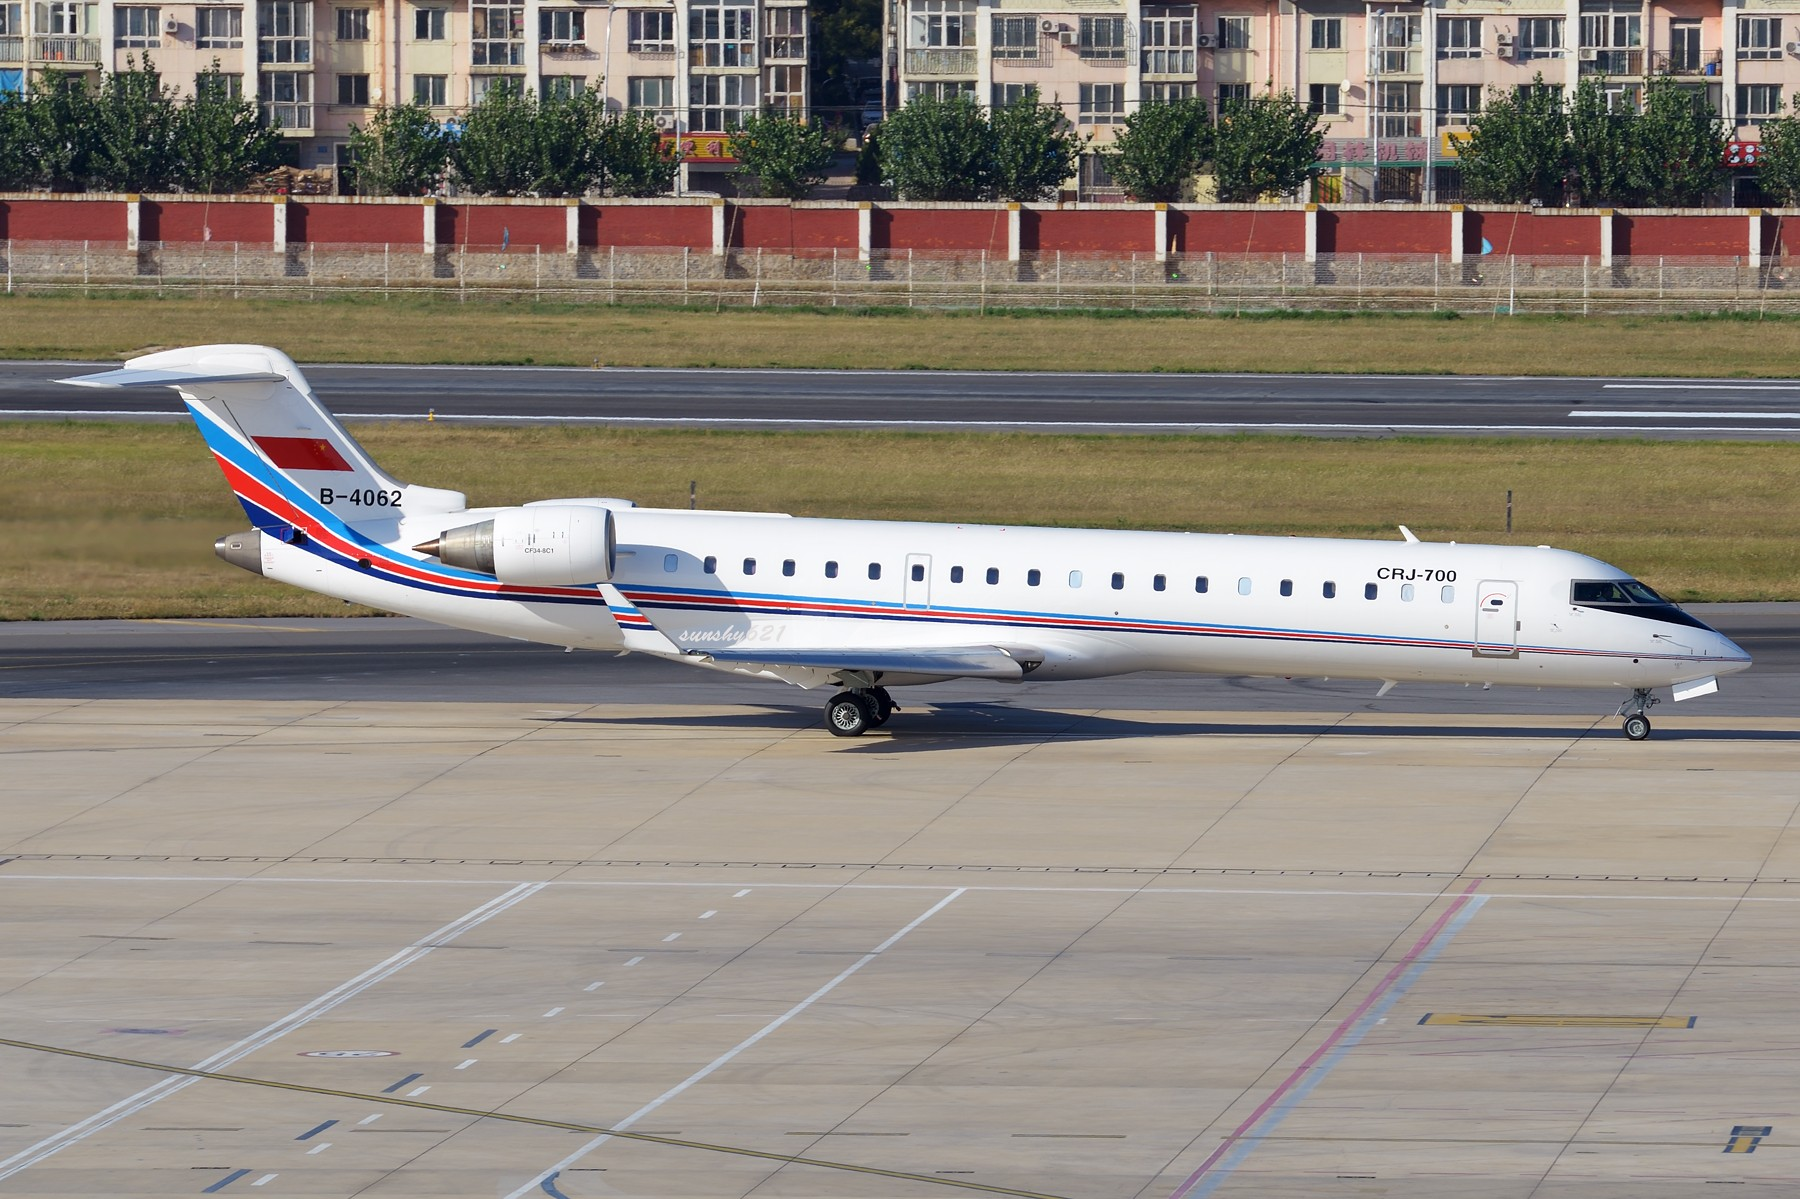 Re:[原创]★[DLC]一点有趣的事情(持续更新中)★ BOMBARDIER CRJ-700 B-4062 中国大连国际机场